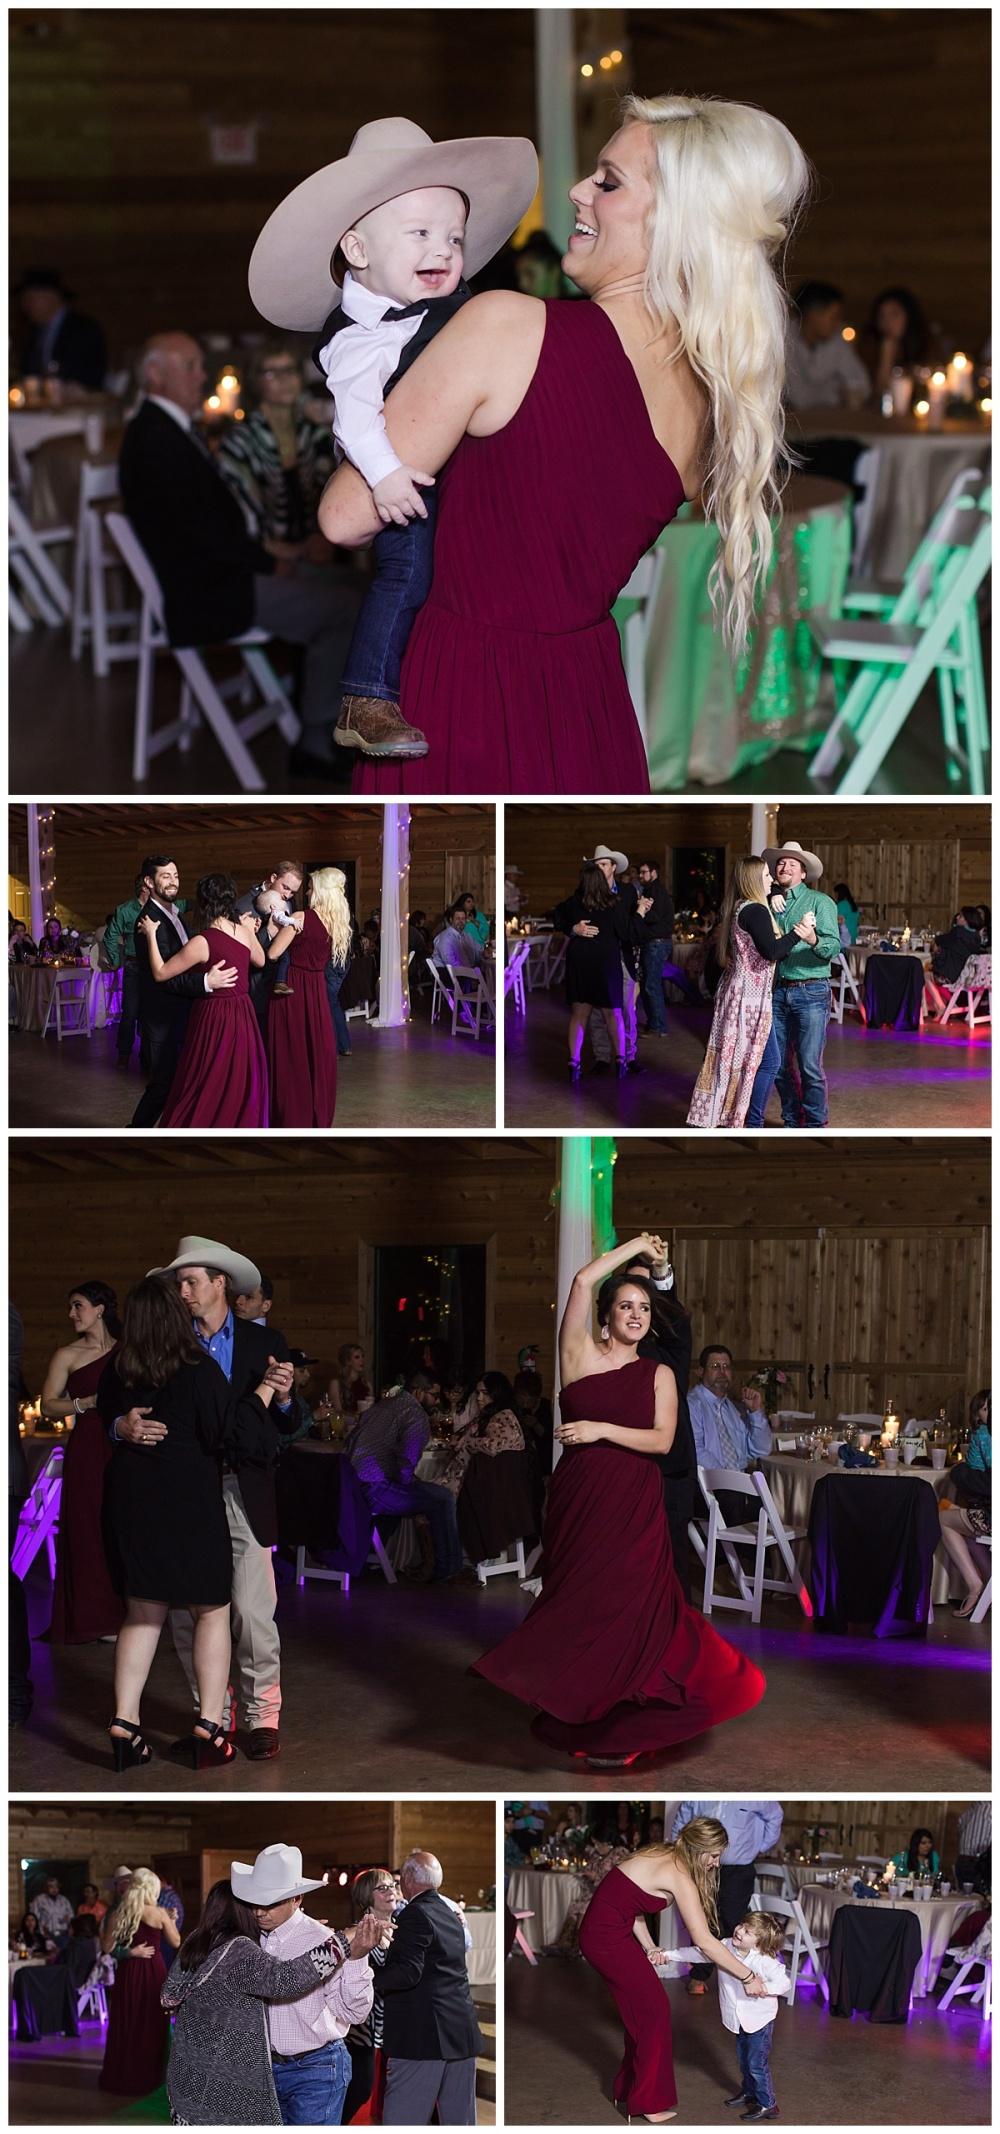 Carly-Barton-Photography-Geronimo-Oaks-Wedding-Venue-Texas-Hill-Country-Ronnie-Sarah_0121.jpg